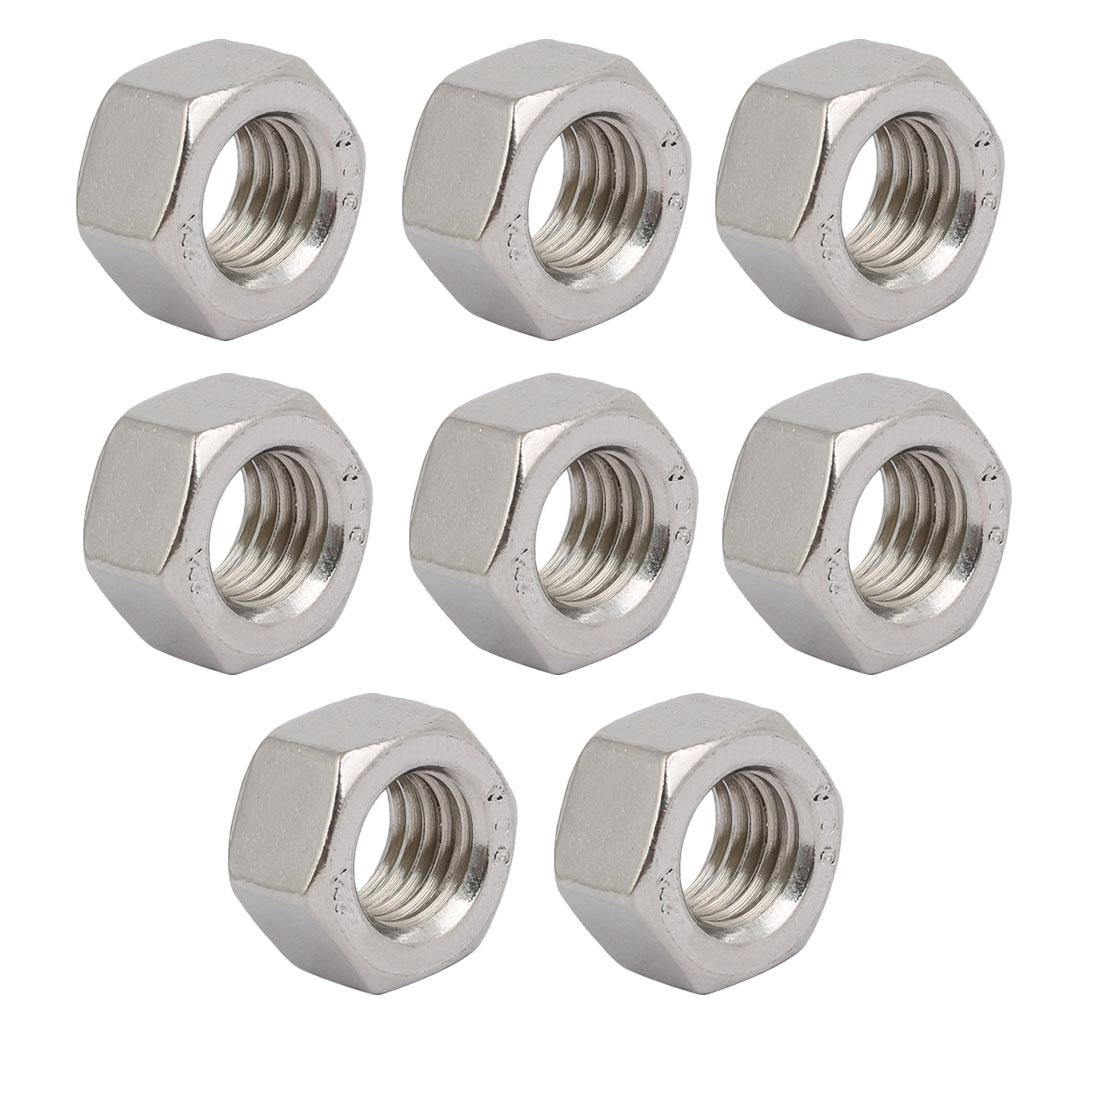 "8pcs 5/8""-11 BSW Thread 304 Stainless Steel Hex Nut Fastener Silver Tone"